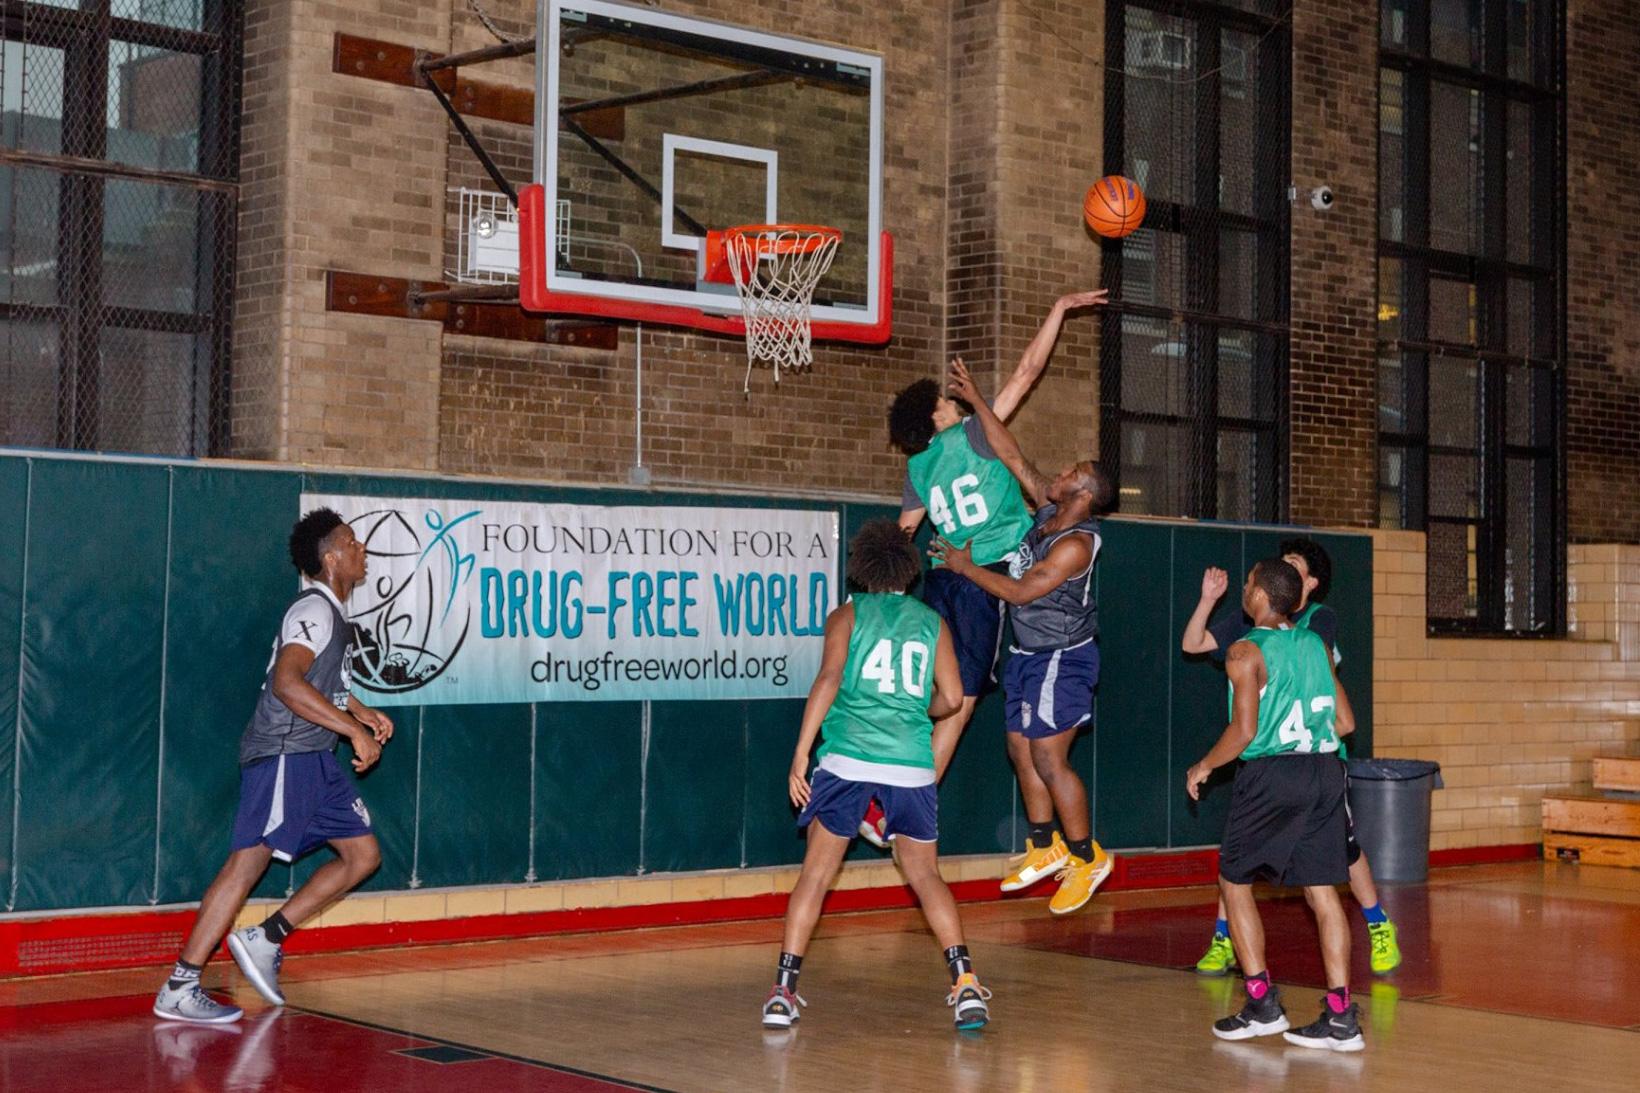 2nd-Annual-Drug-Free-Basketball-Tournament-09.jpg